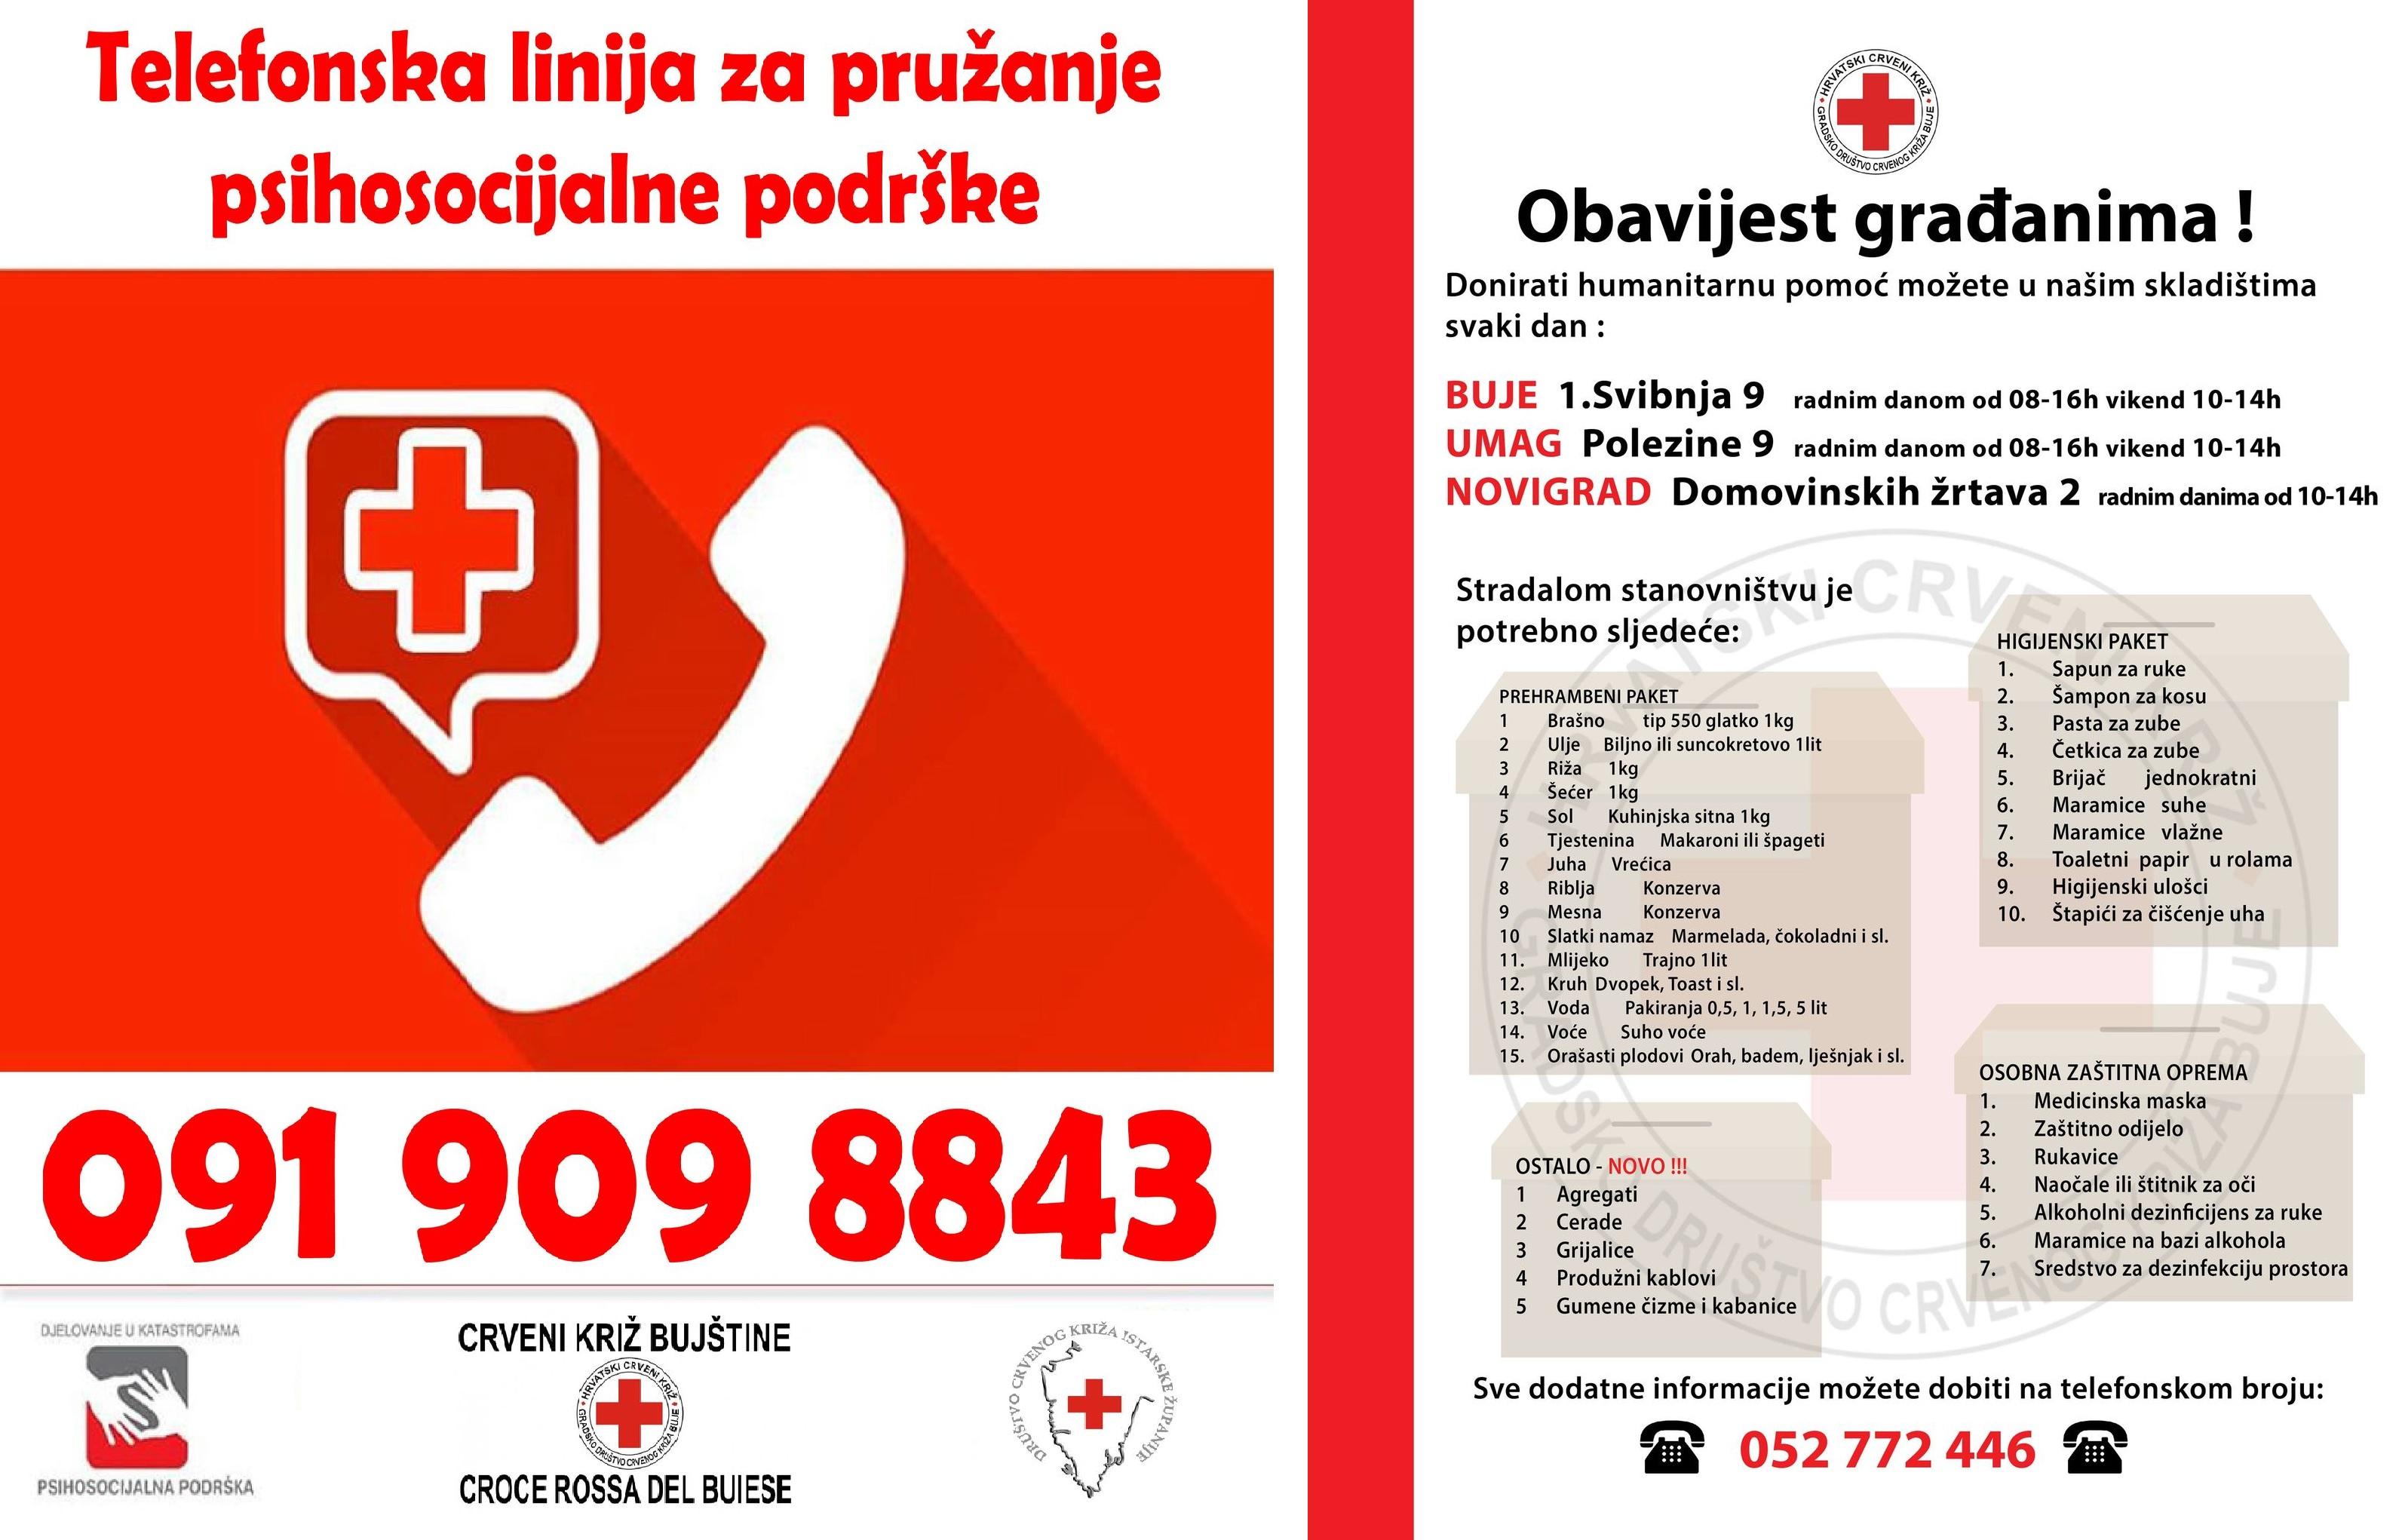 http://www.novigrad.hr/crveni_krizh_bujshtine_objavio_aktualne_potrebe_za_humanitarnom_pomoi_i_uve